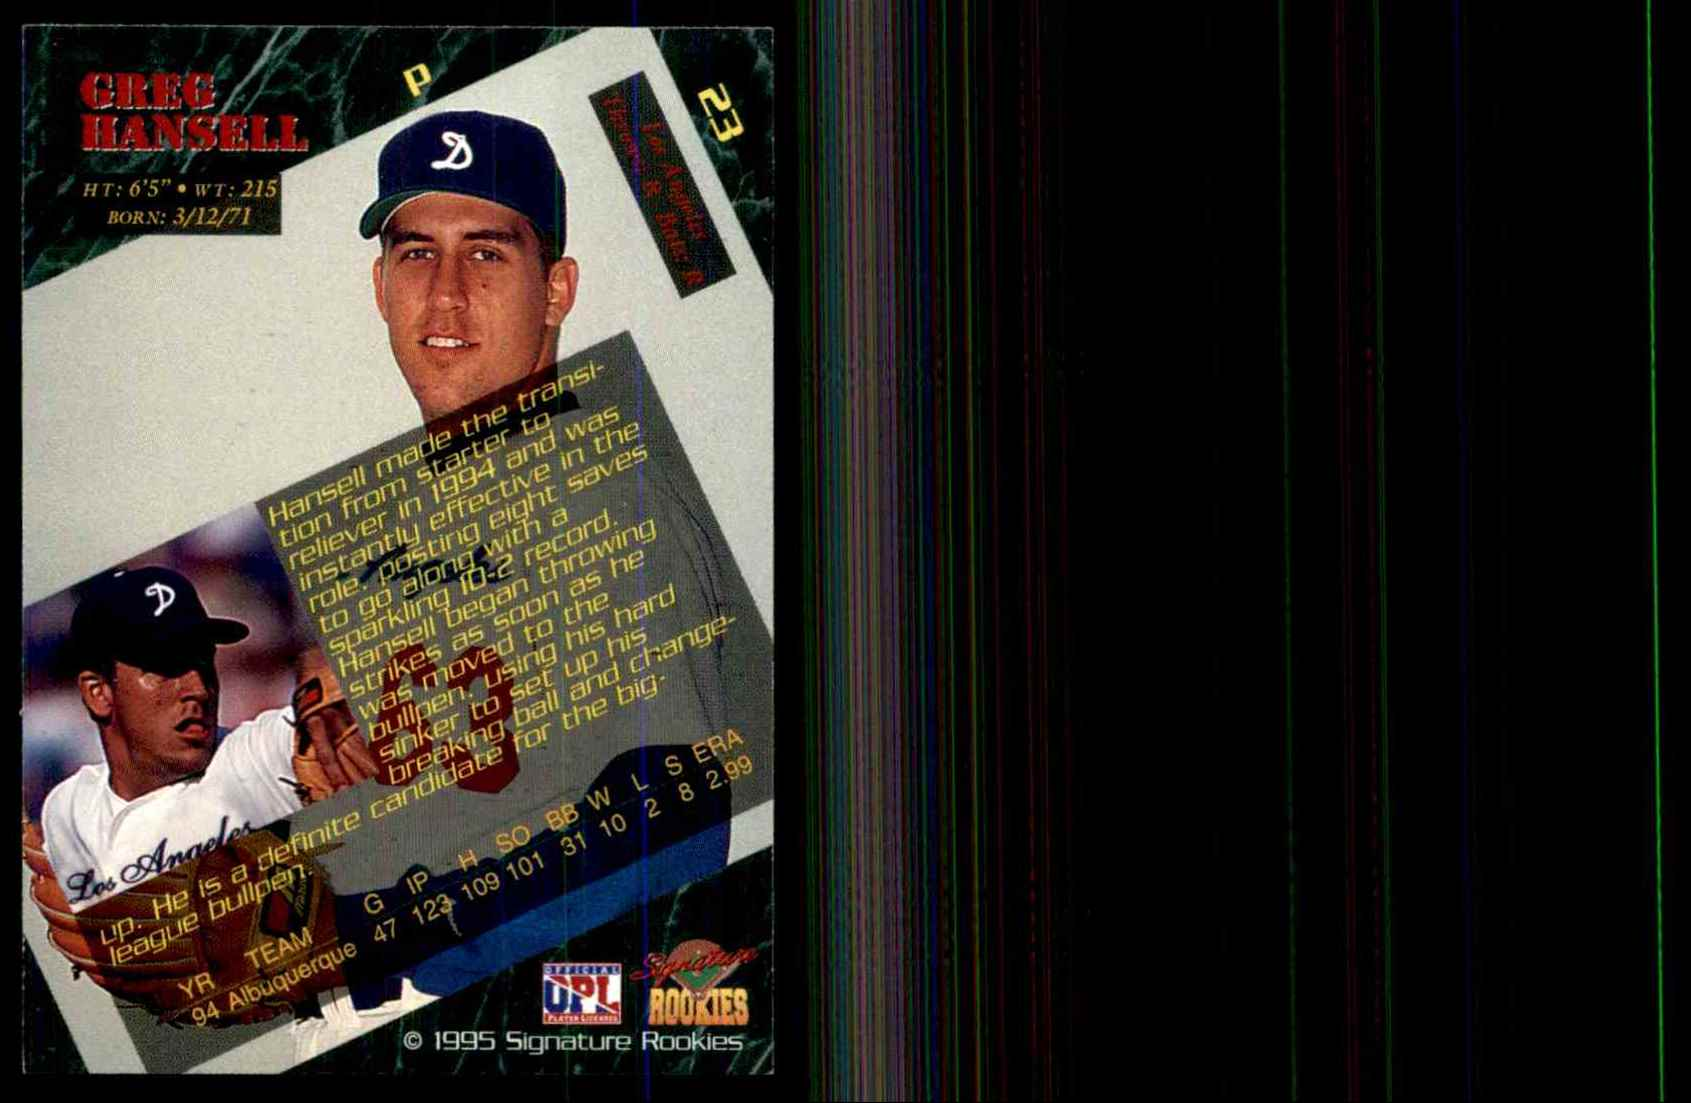 1995 Signature Rookies Greg Hansell #23 card back image